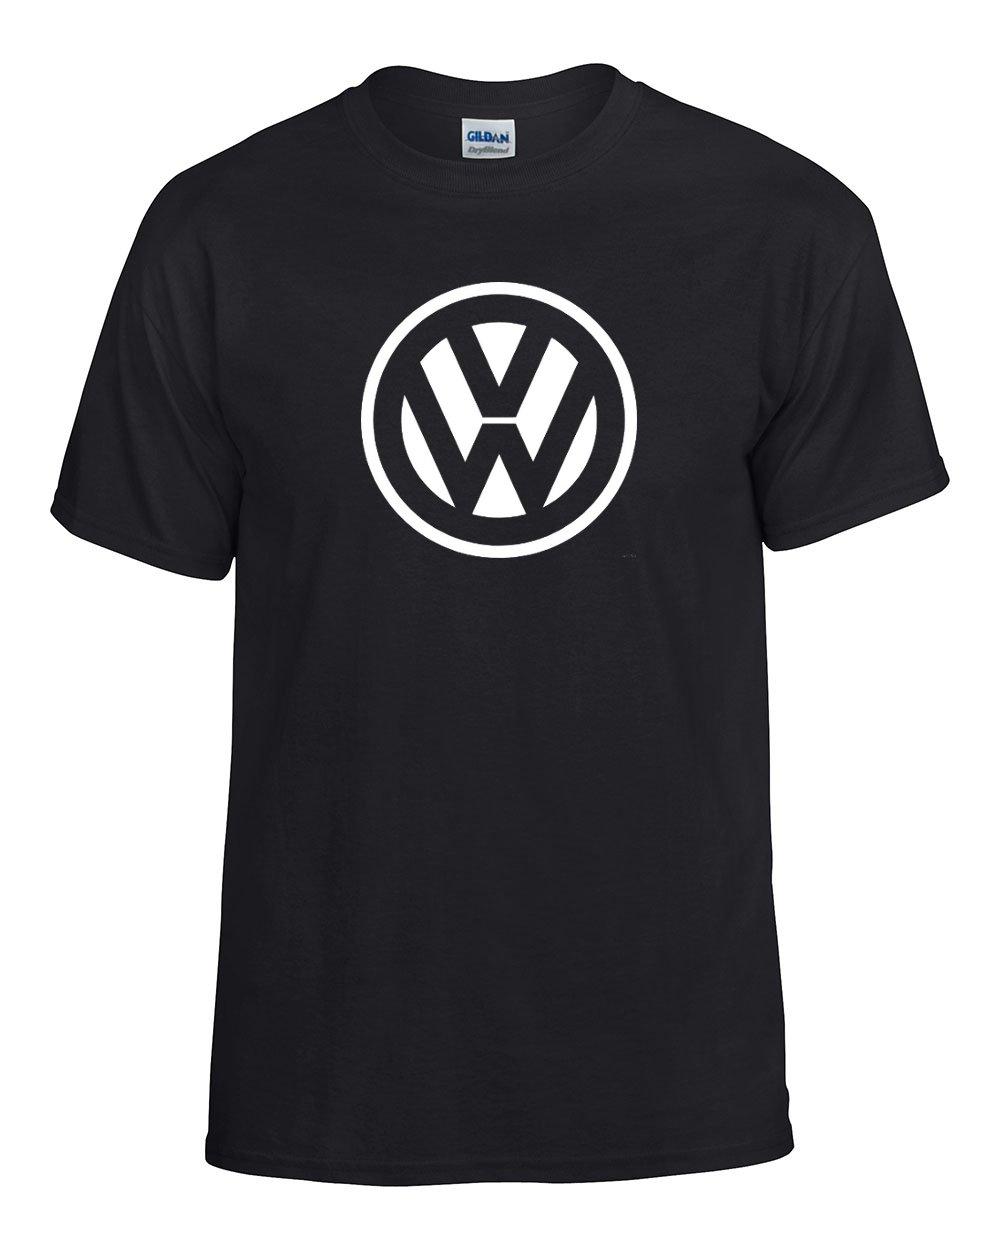 Vintage Vw T Shirt S Black